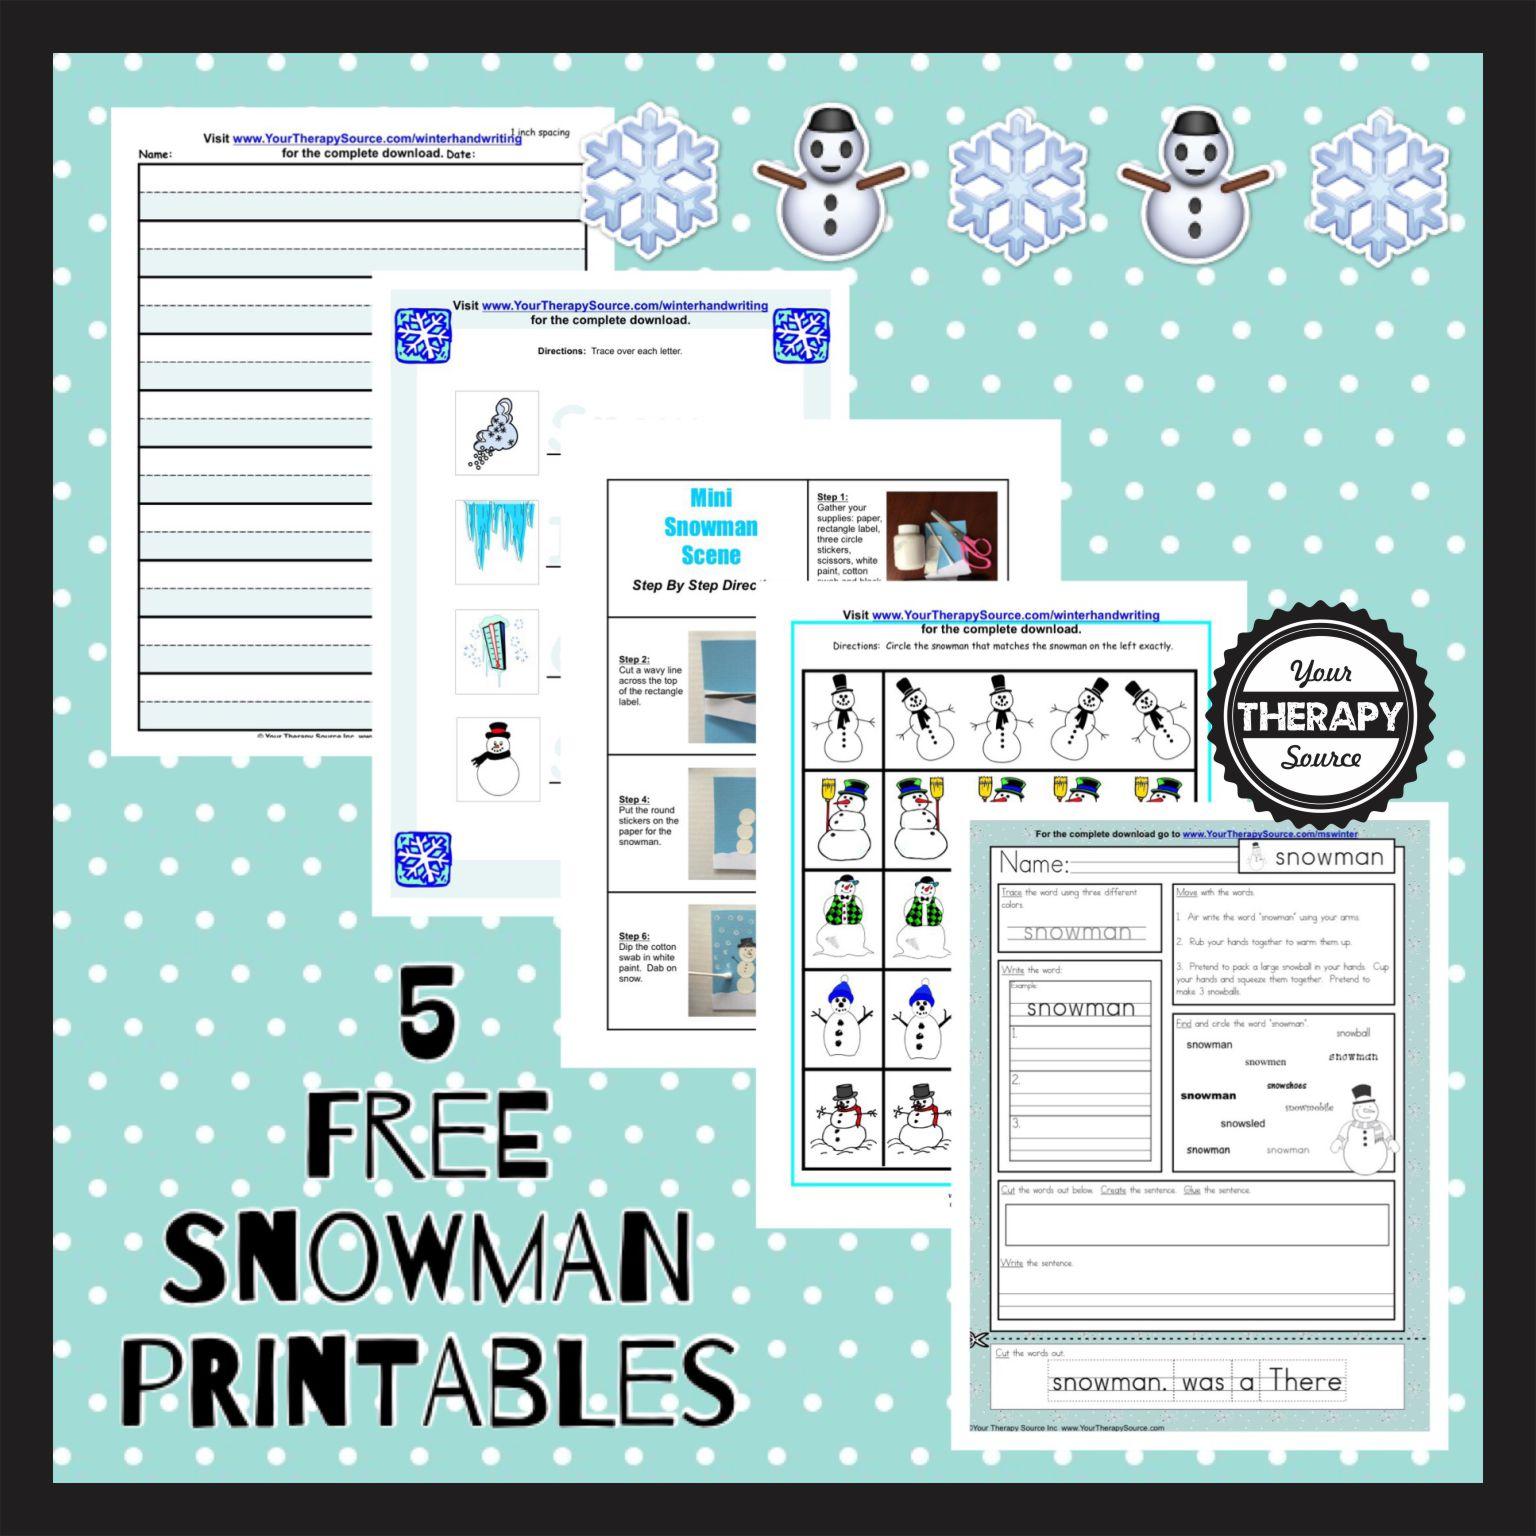 5 Free Snowman Printables